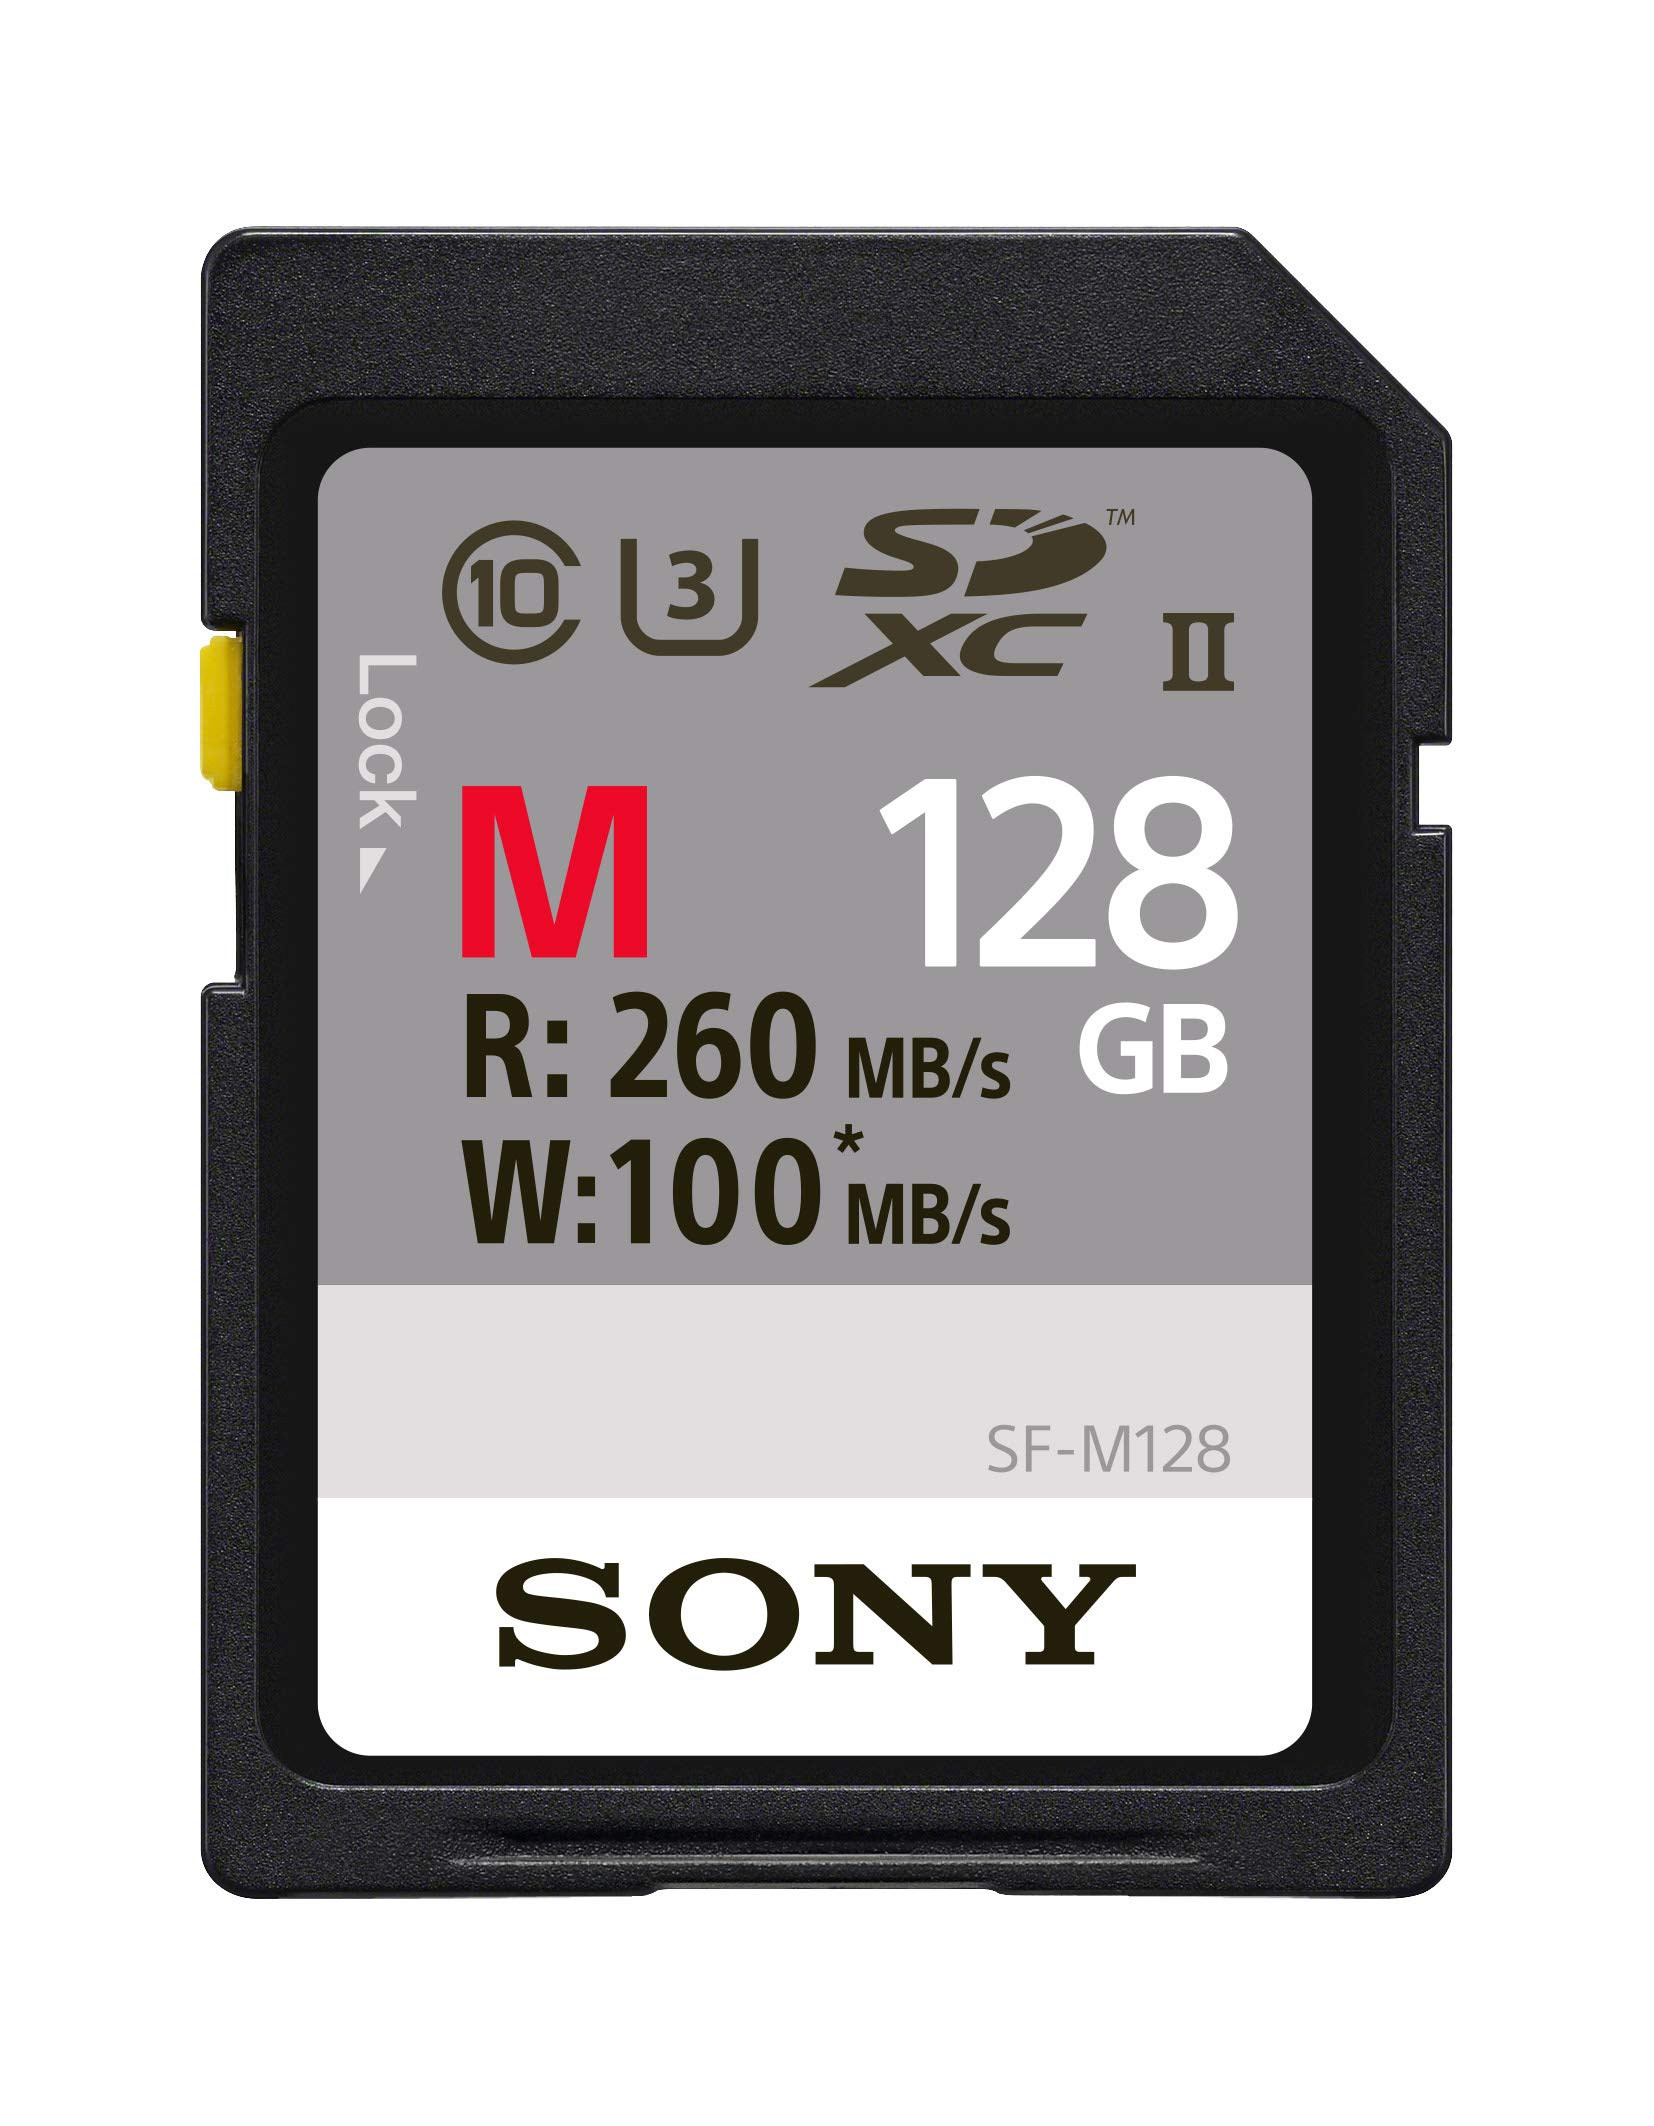 Sony Memory Card 128GB, UHS-II SD, CL10, U3, Max R260MB/s, W100MB/s (SF-M128/T)